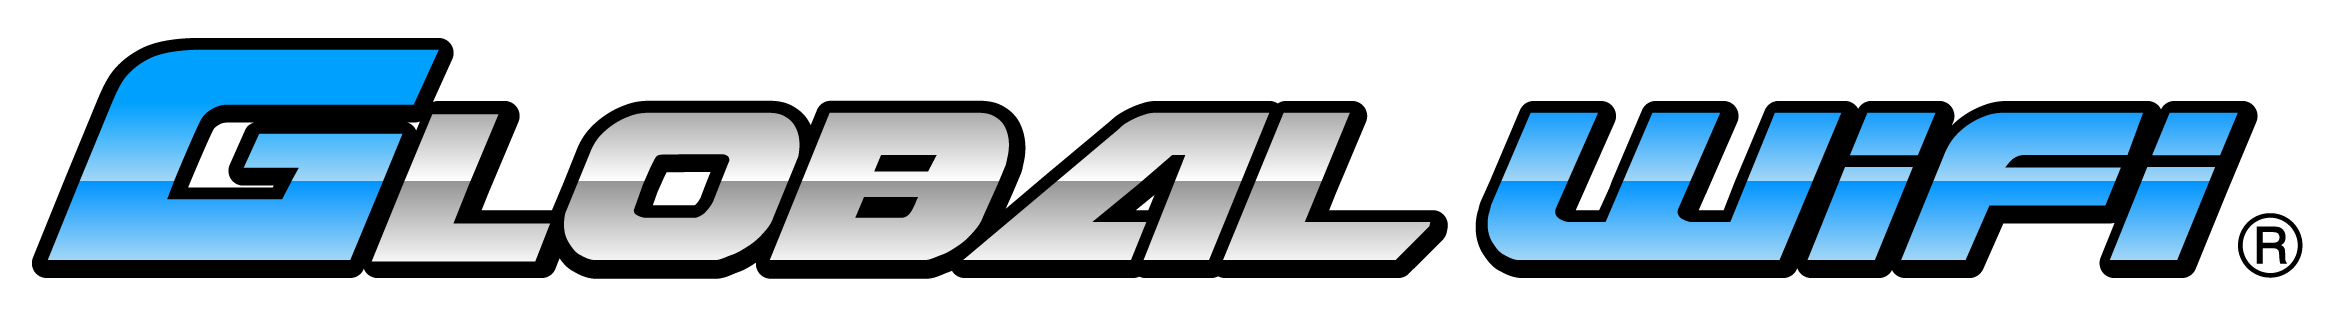 Logo 968